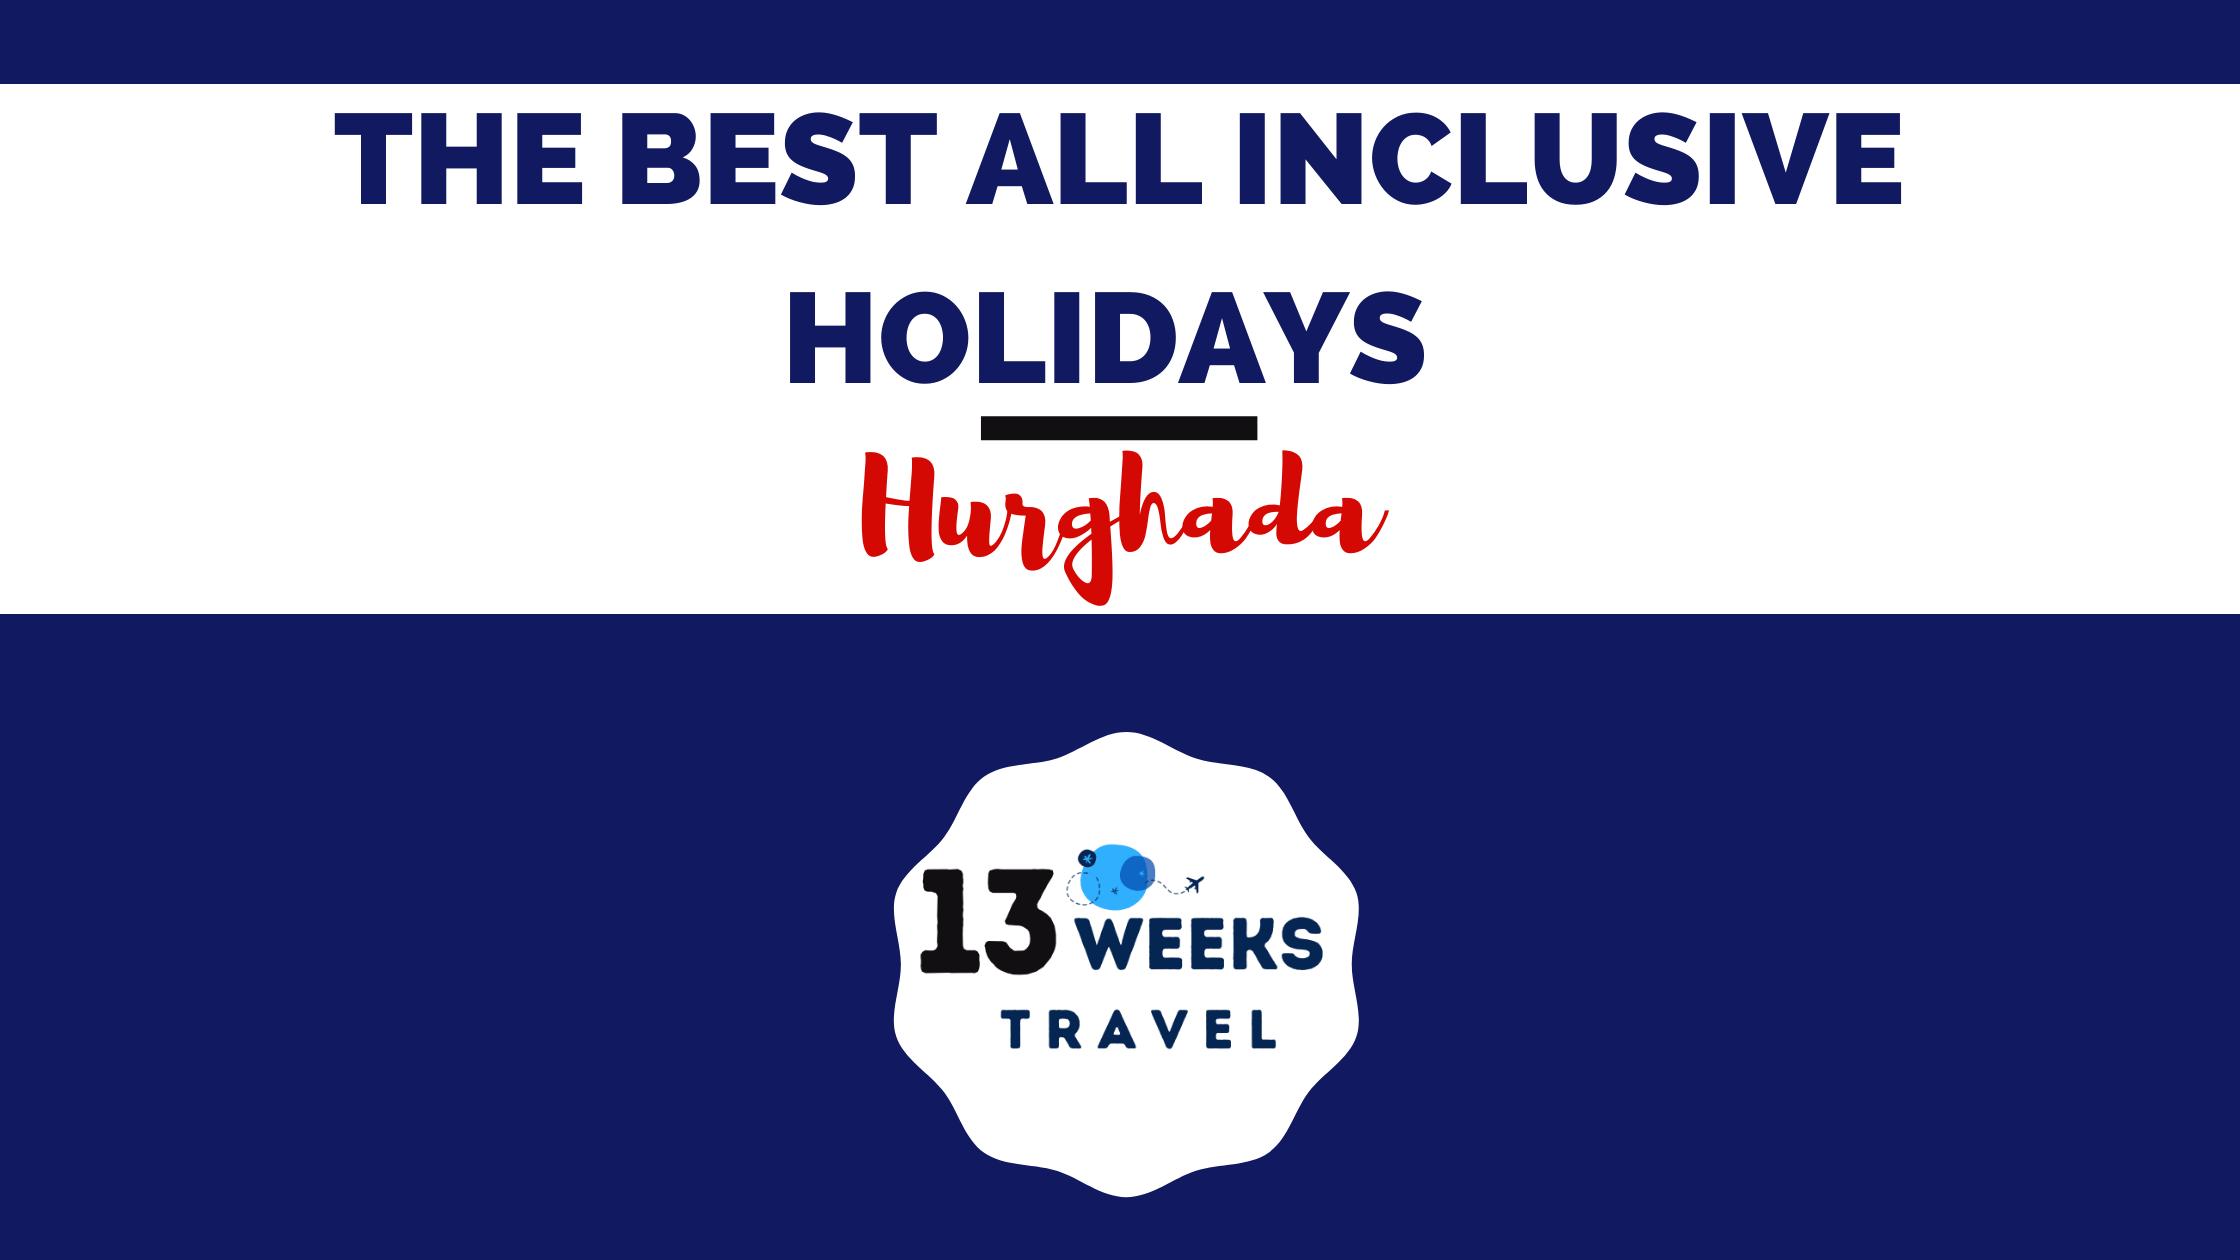 All Inclusive Holidays Hurghada